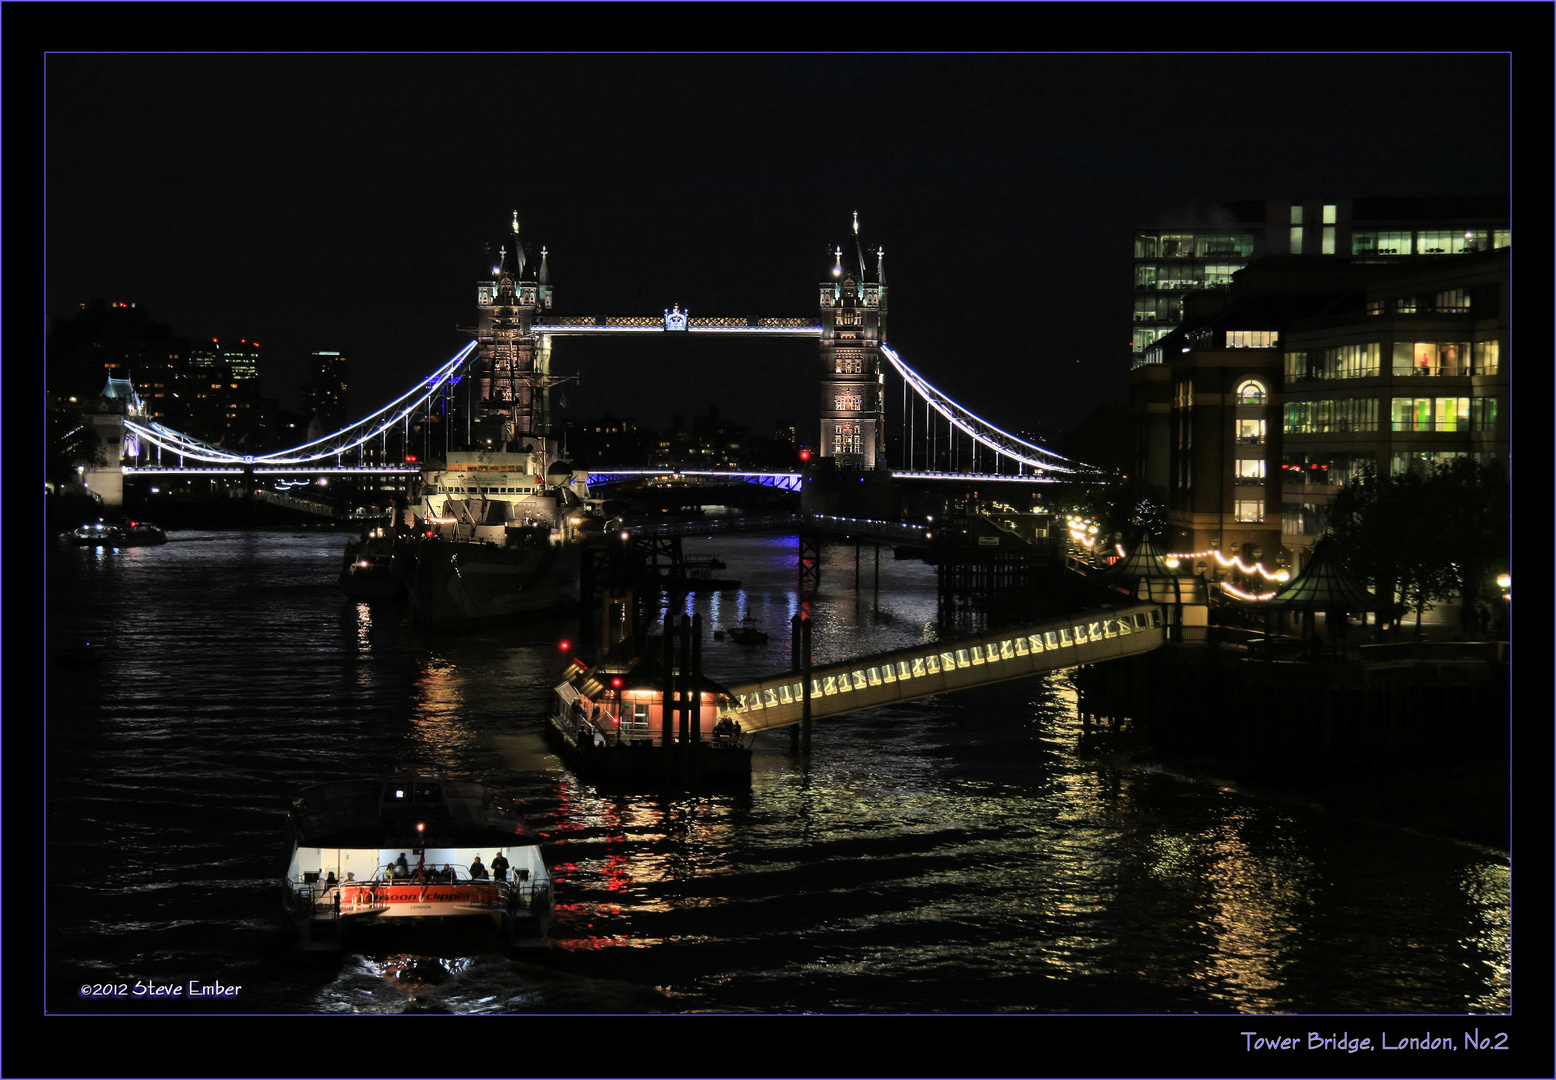 Tower Bridge, London, No.2